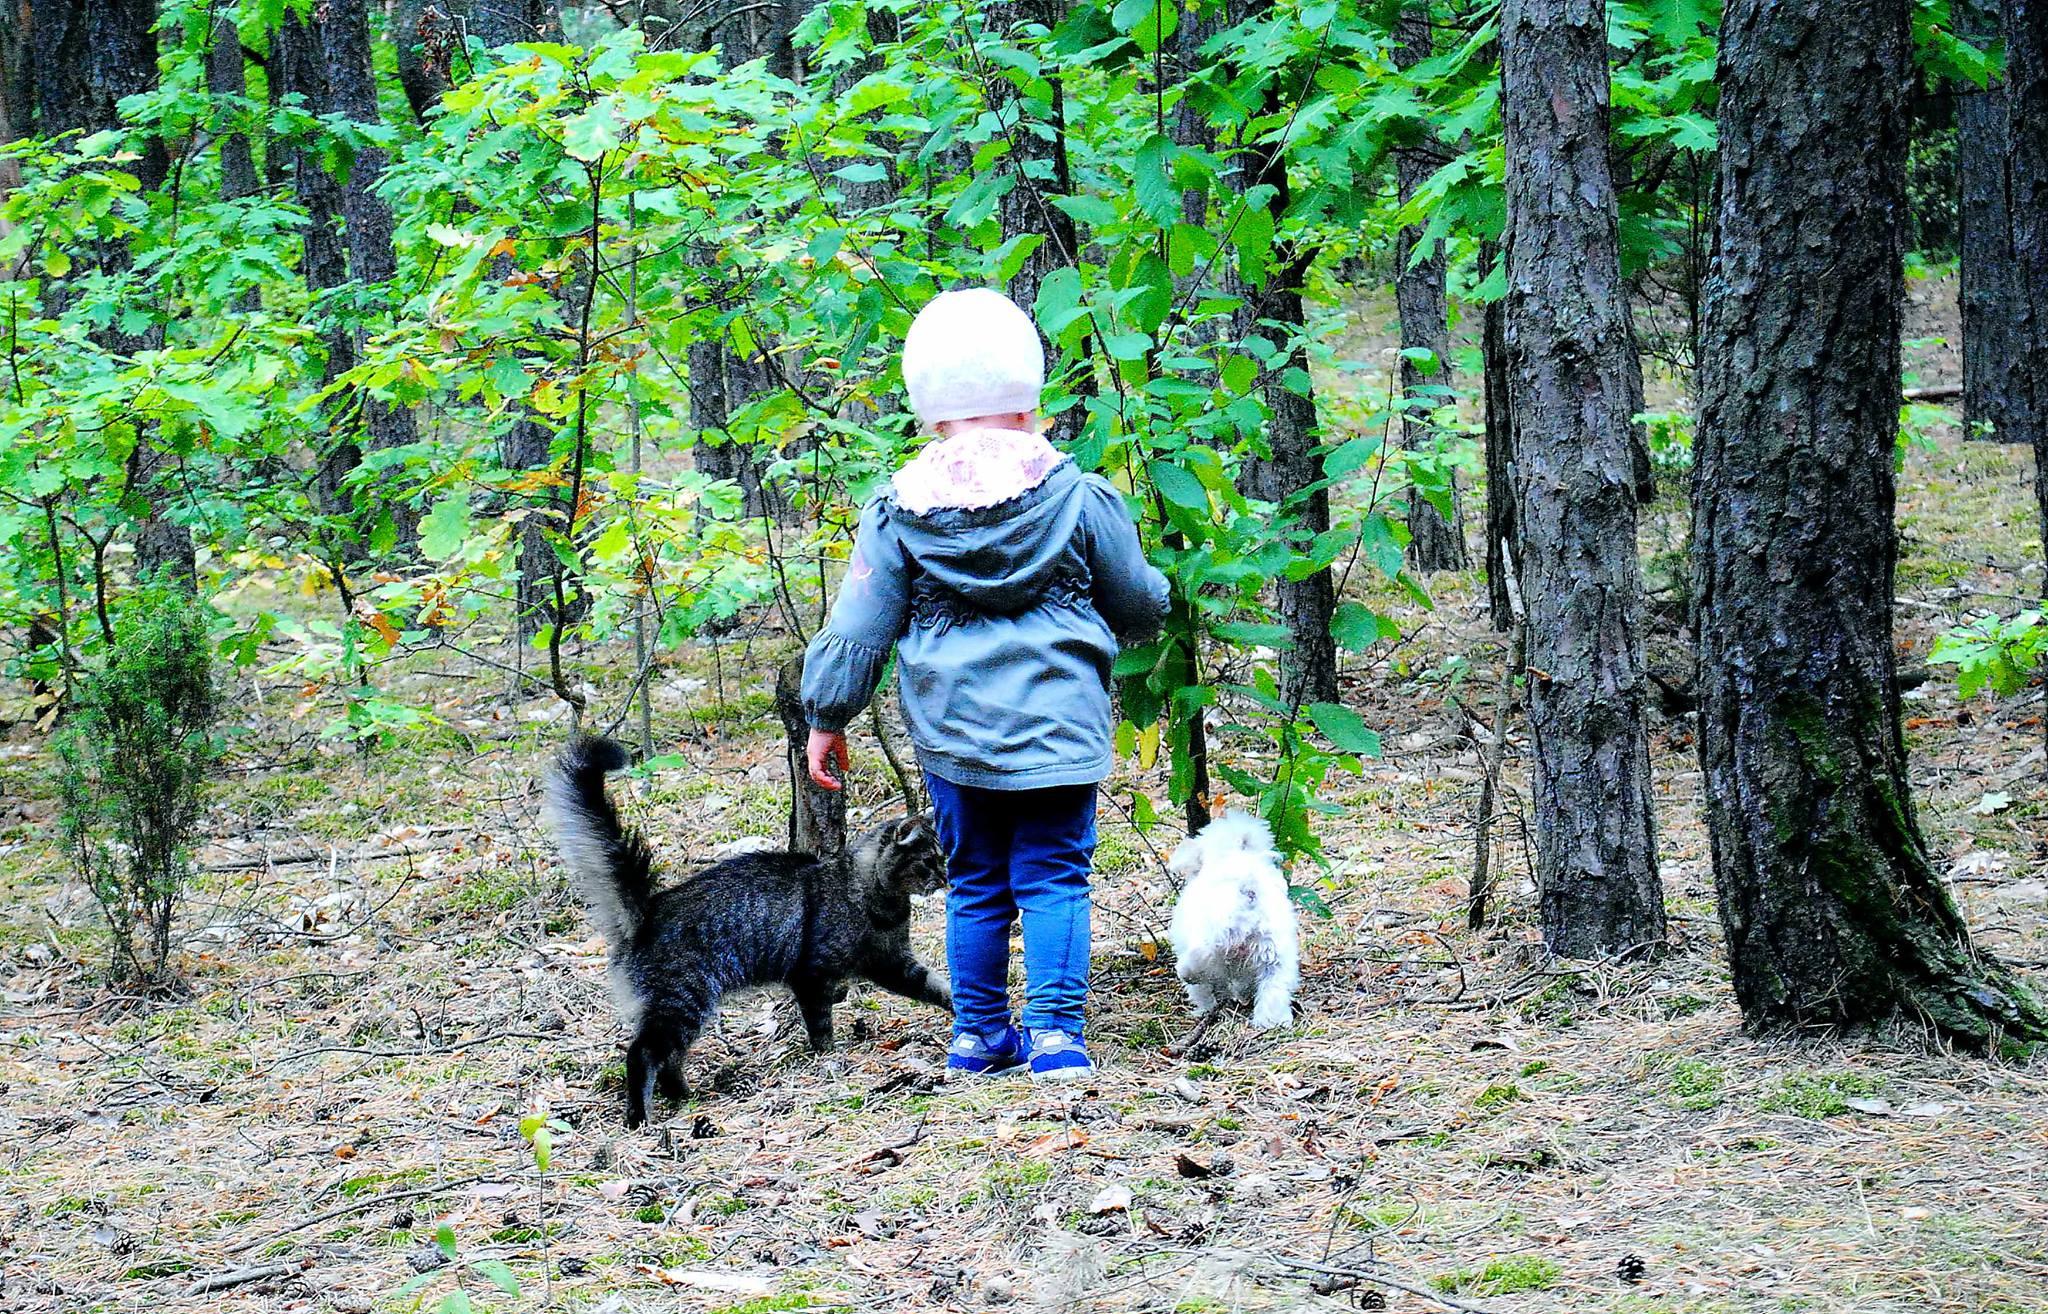 Kot, psy, i dziecięta